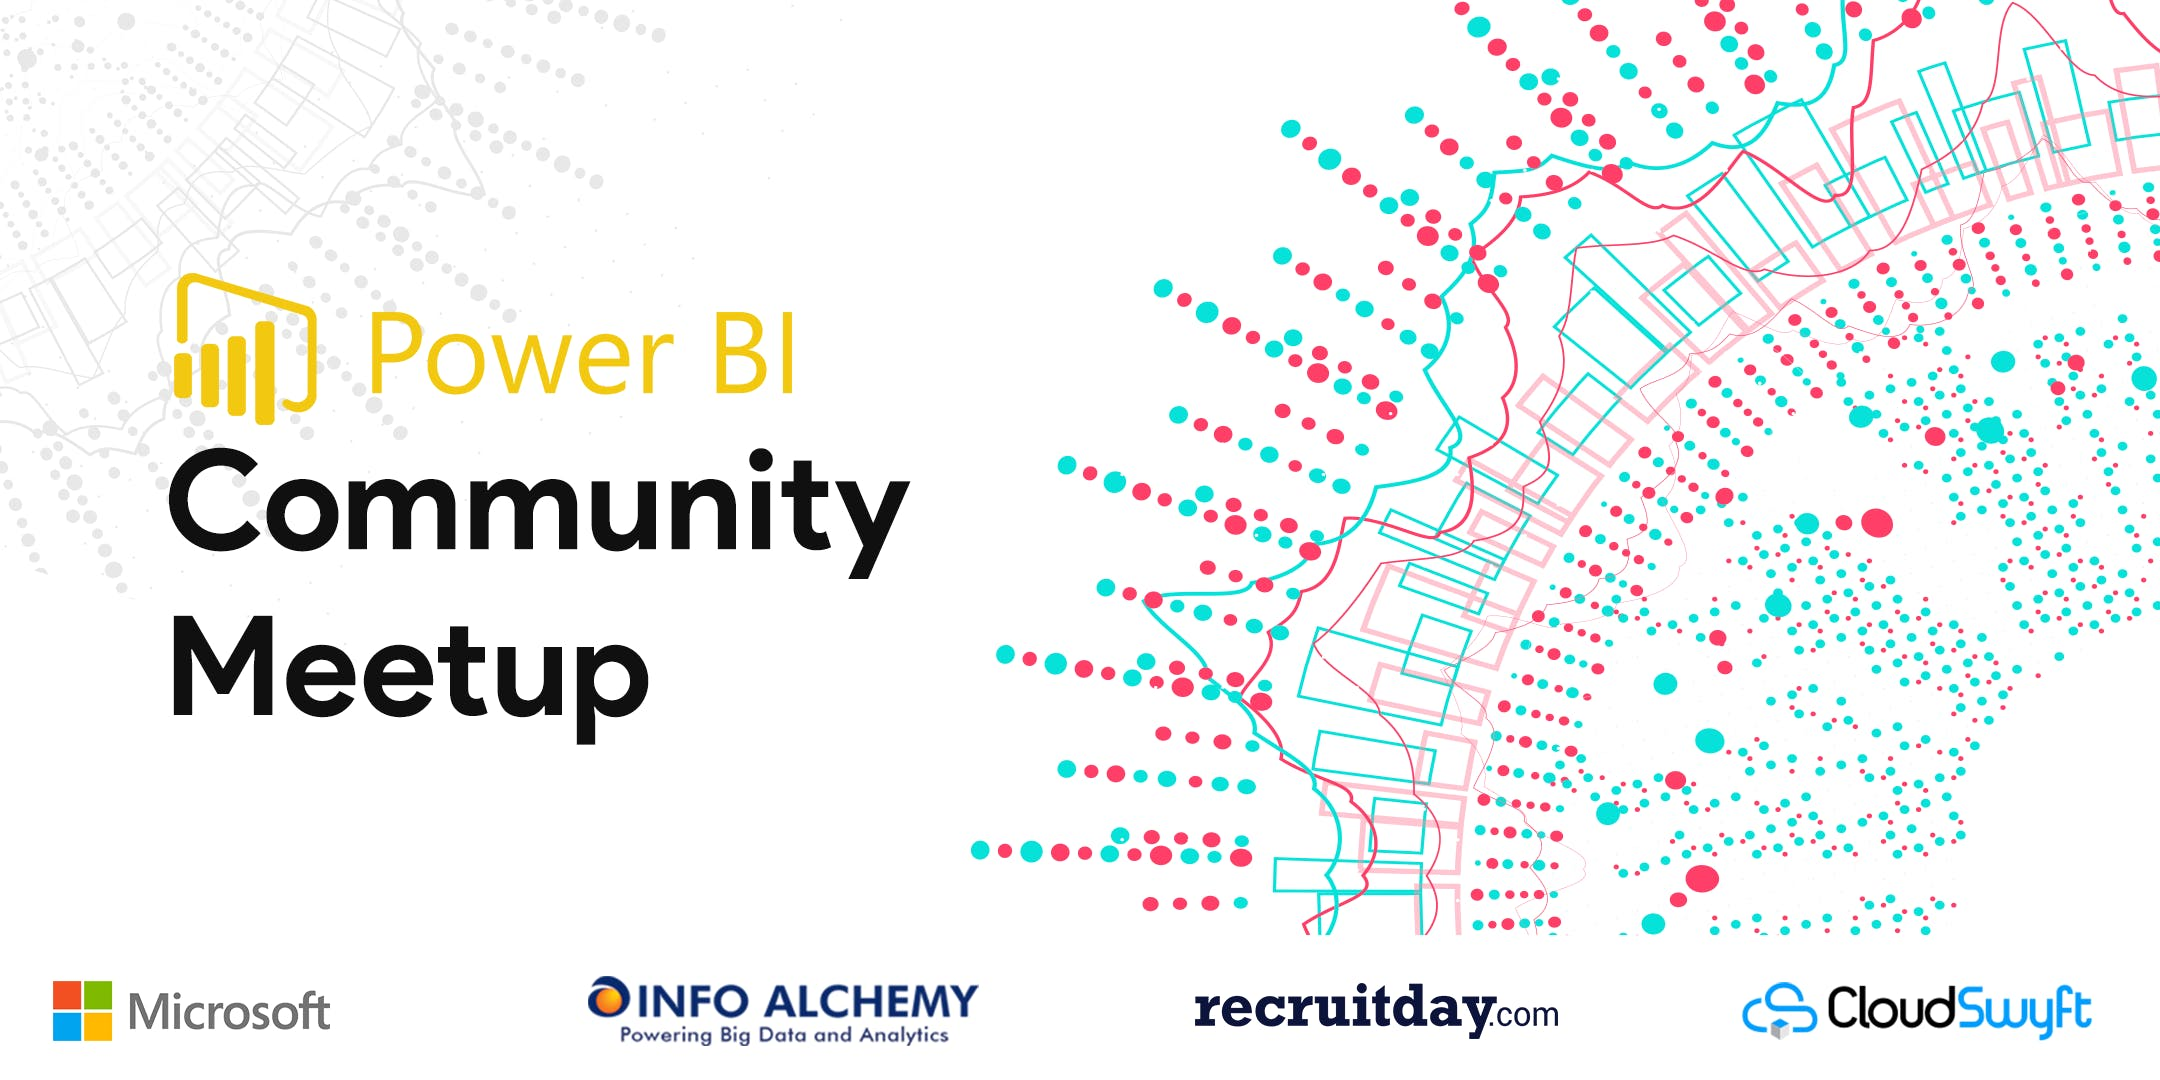 Power BI Community Meetup at Barhead, Makati